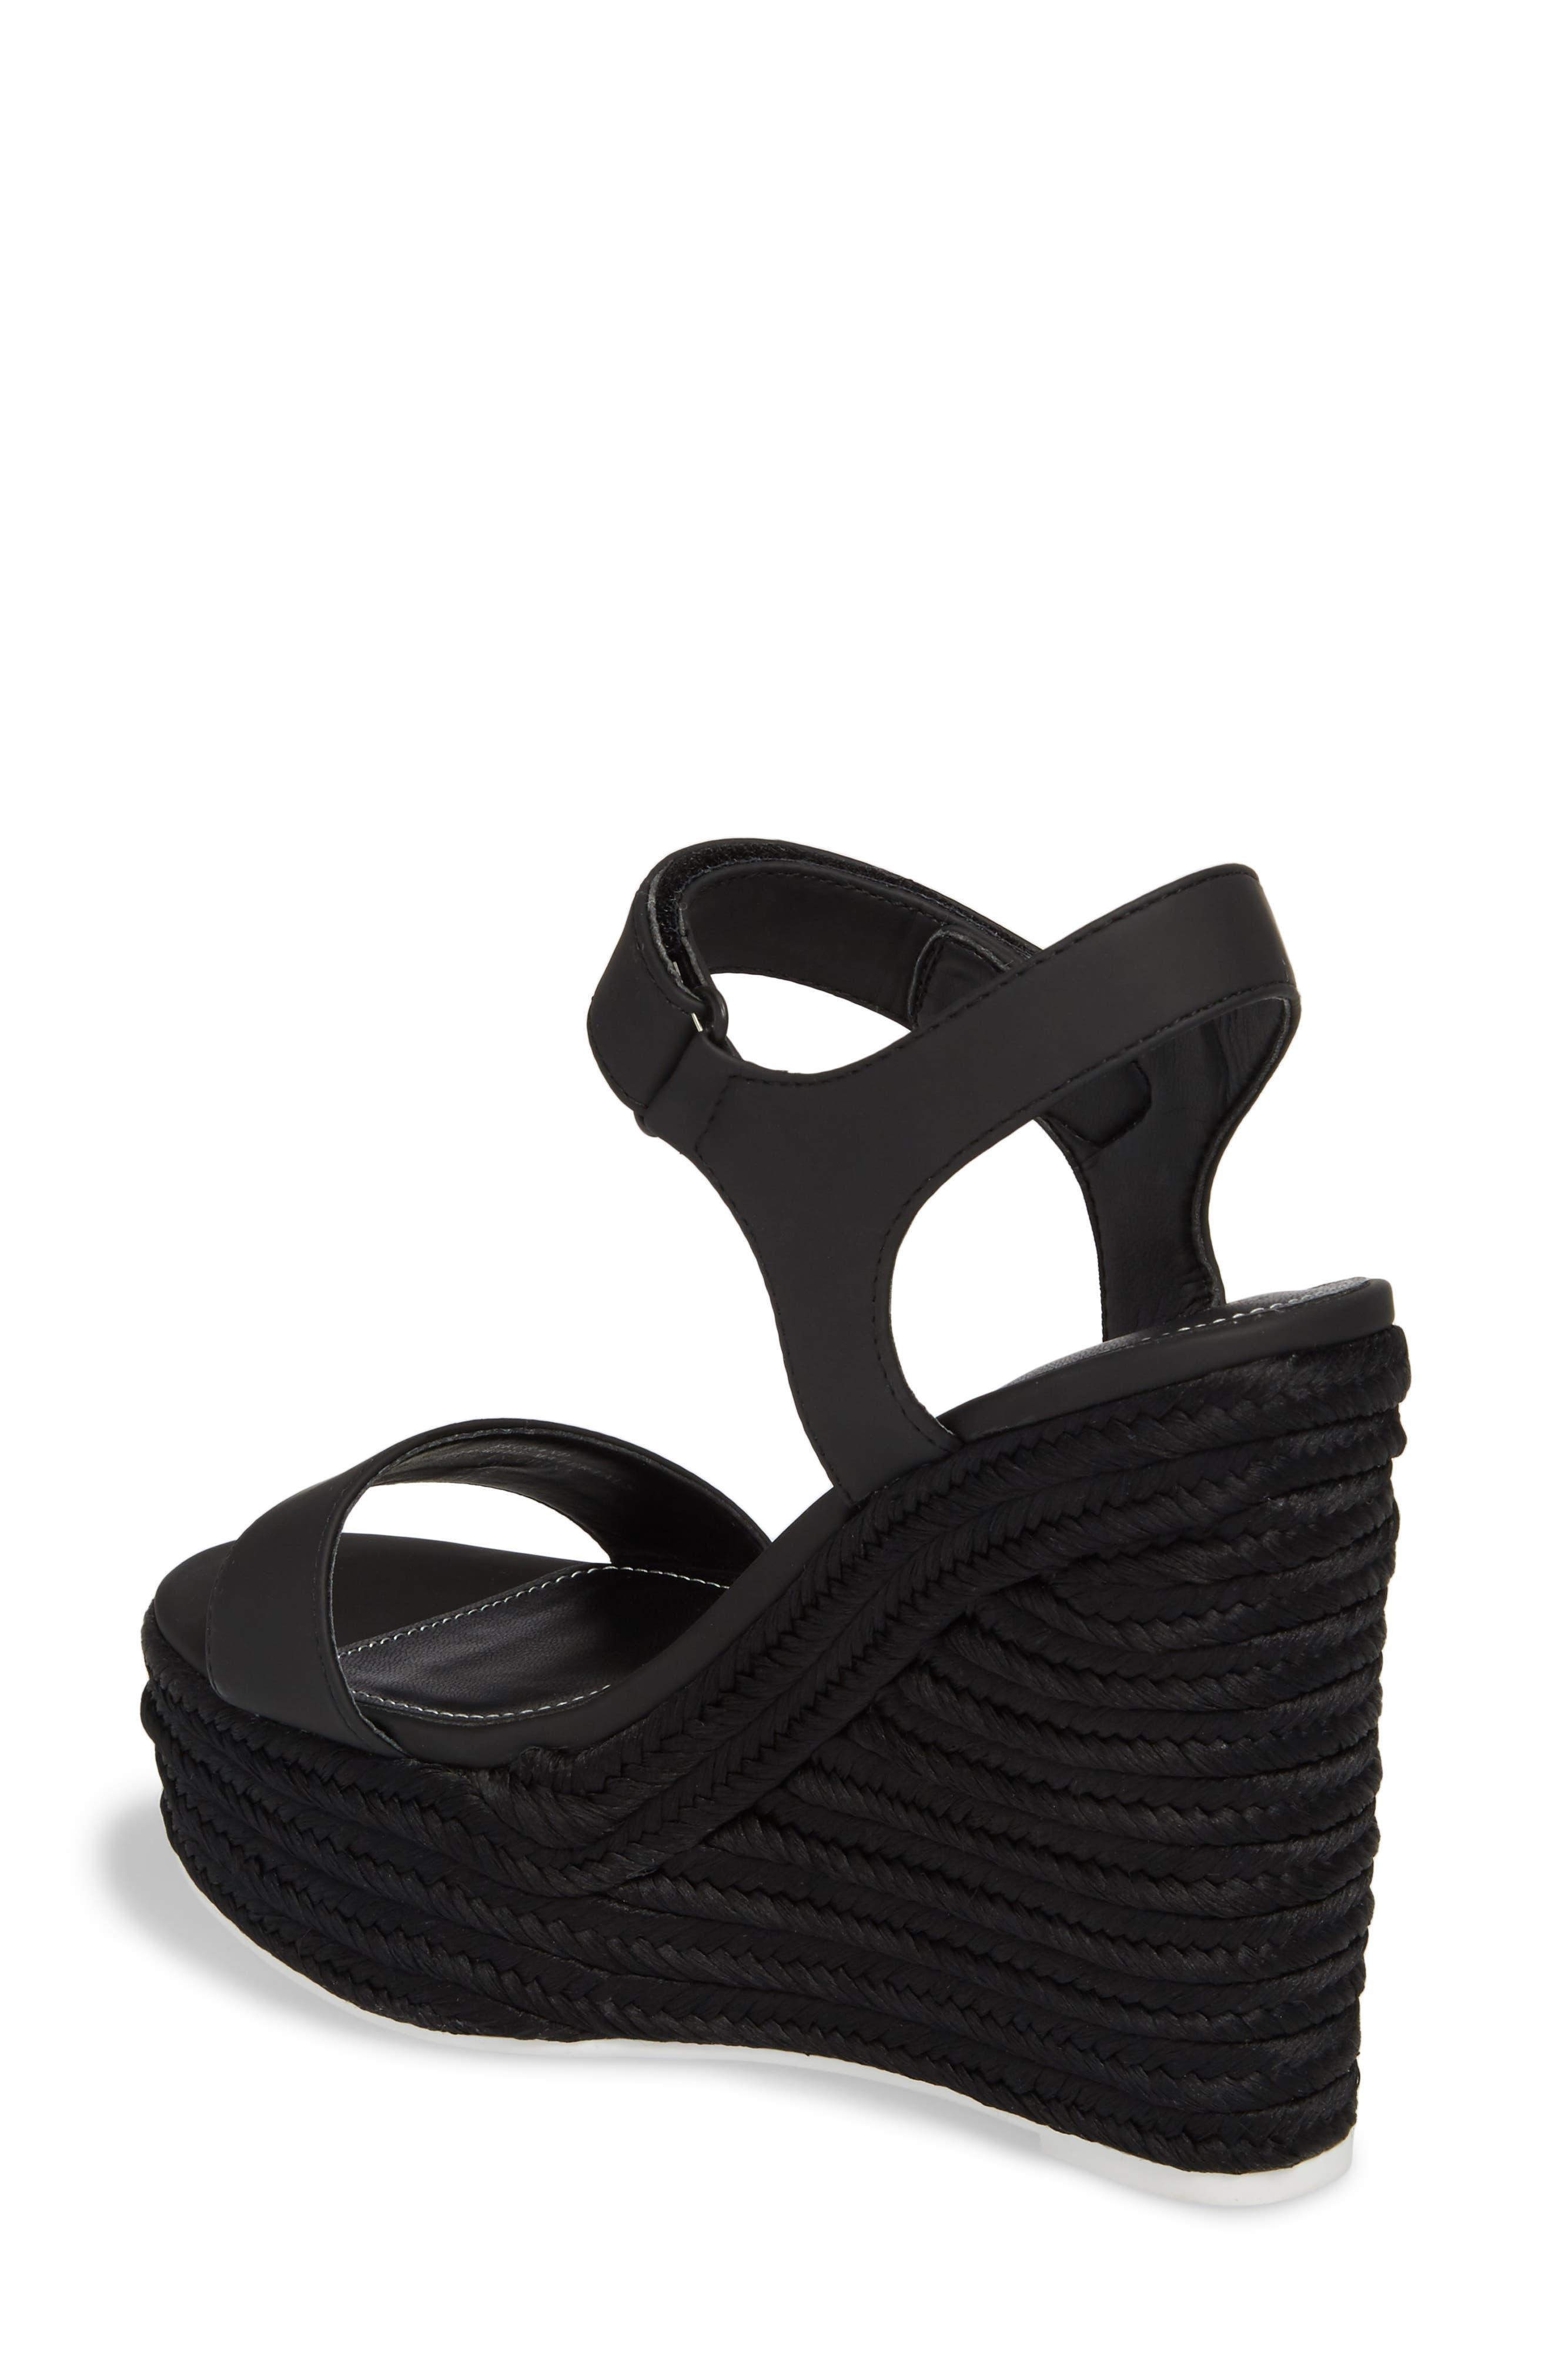 Grand Sport Espadrille Wedge Sandal,                             Alternate thumbnail 2, color,                             BLACK